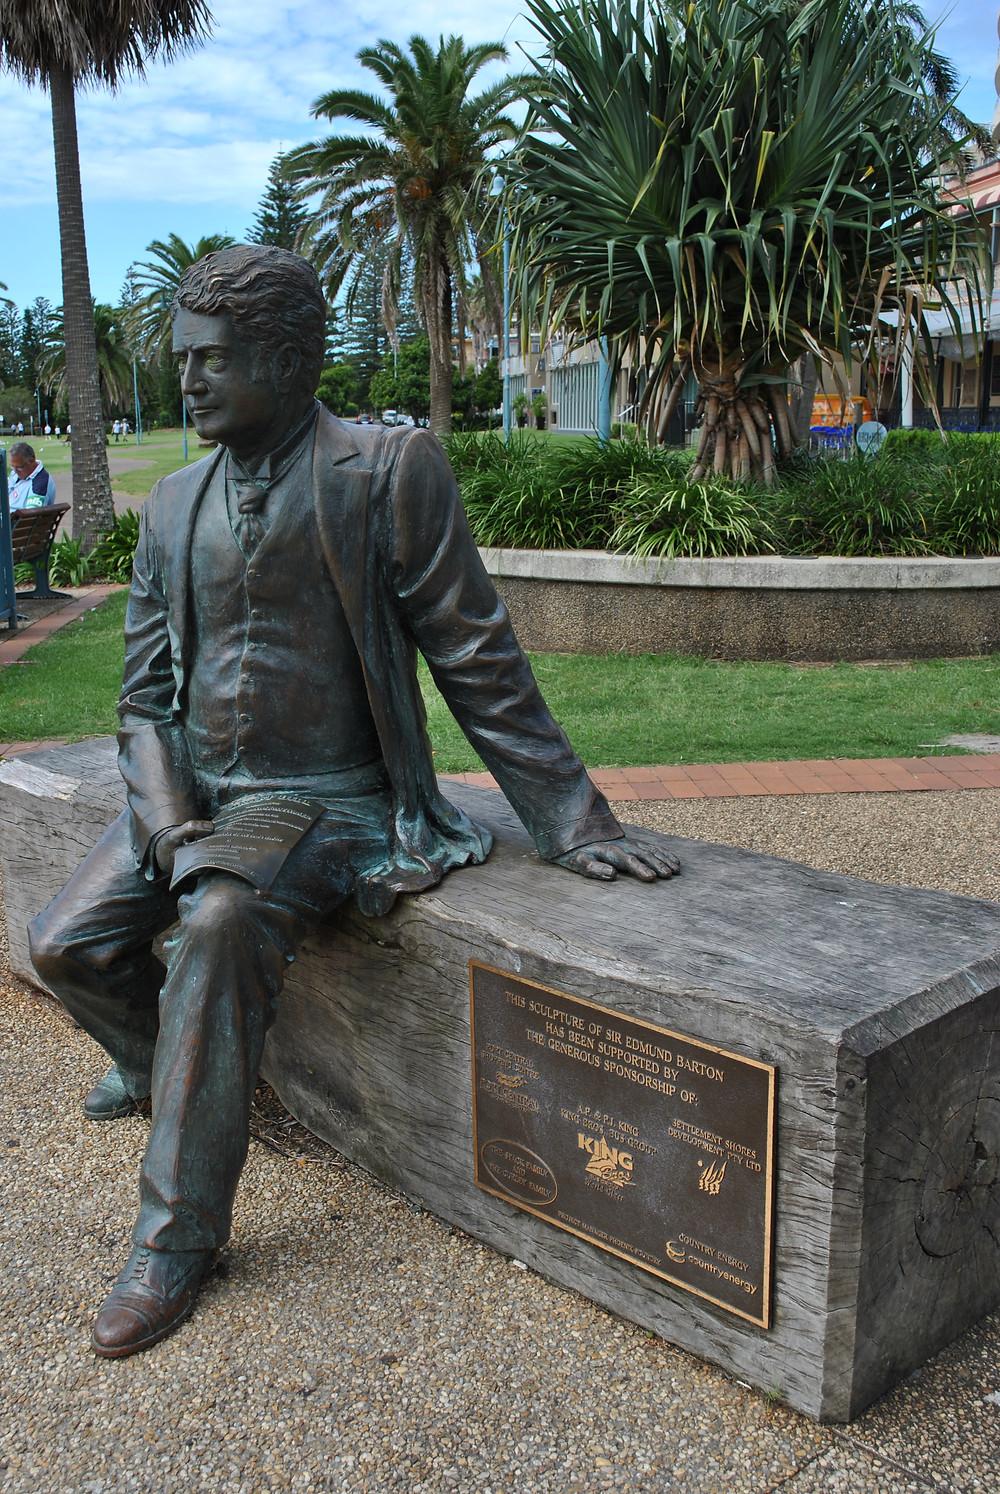 Edmund Barton Oz 1st Prime Minister